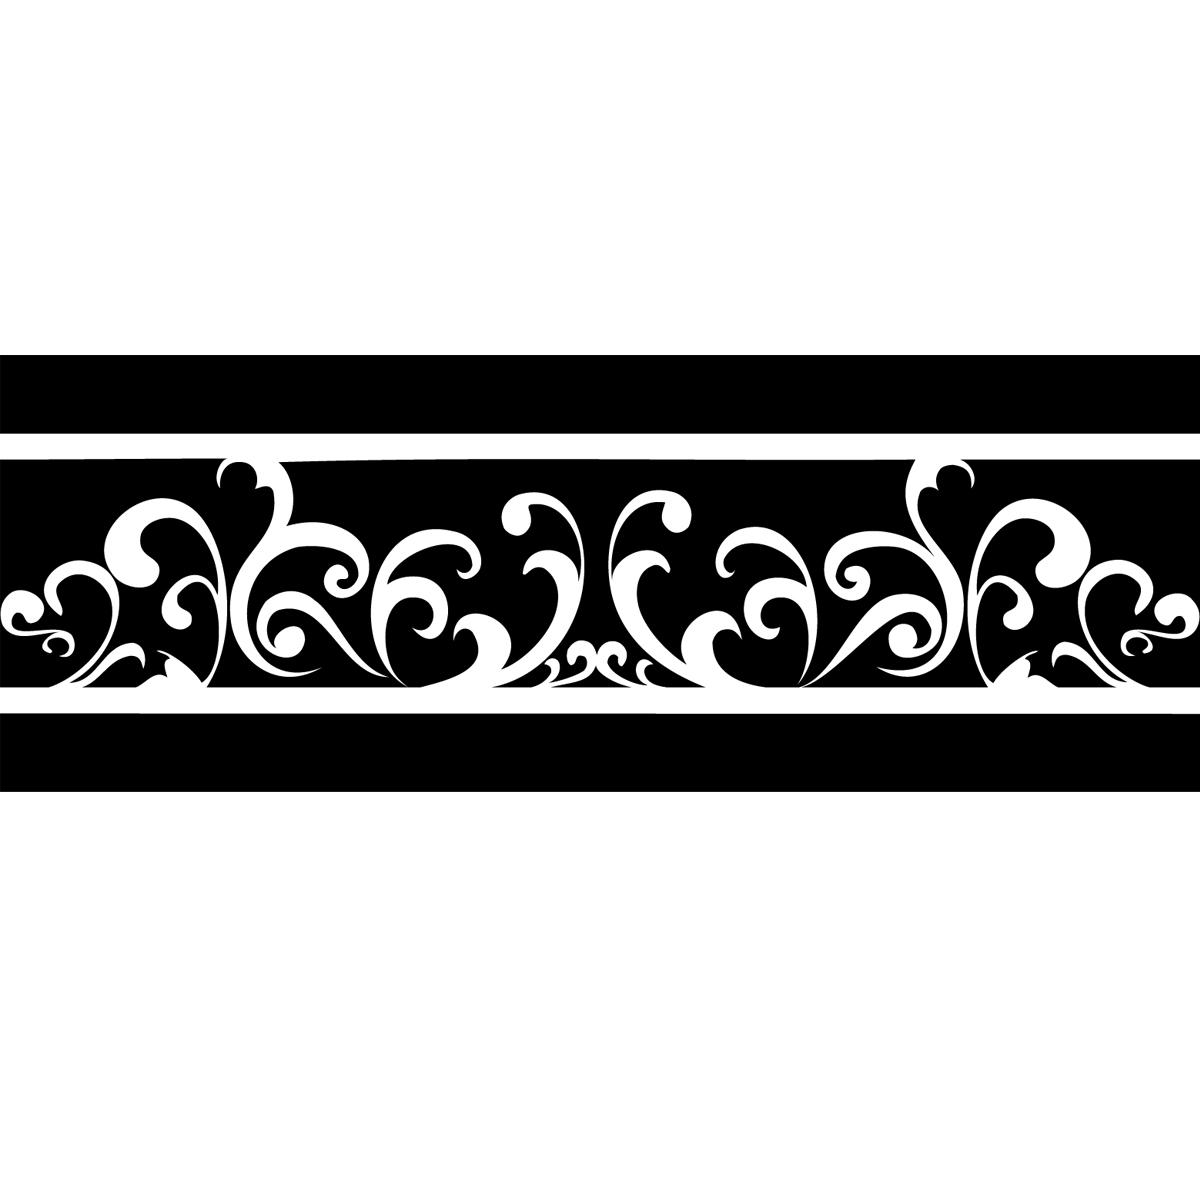 stickers muraux design sticker mural design floral. Black Bedroom Furniture Sets. Home Design Ideas